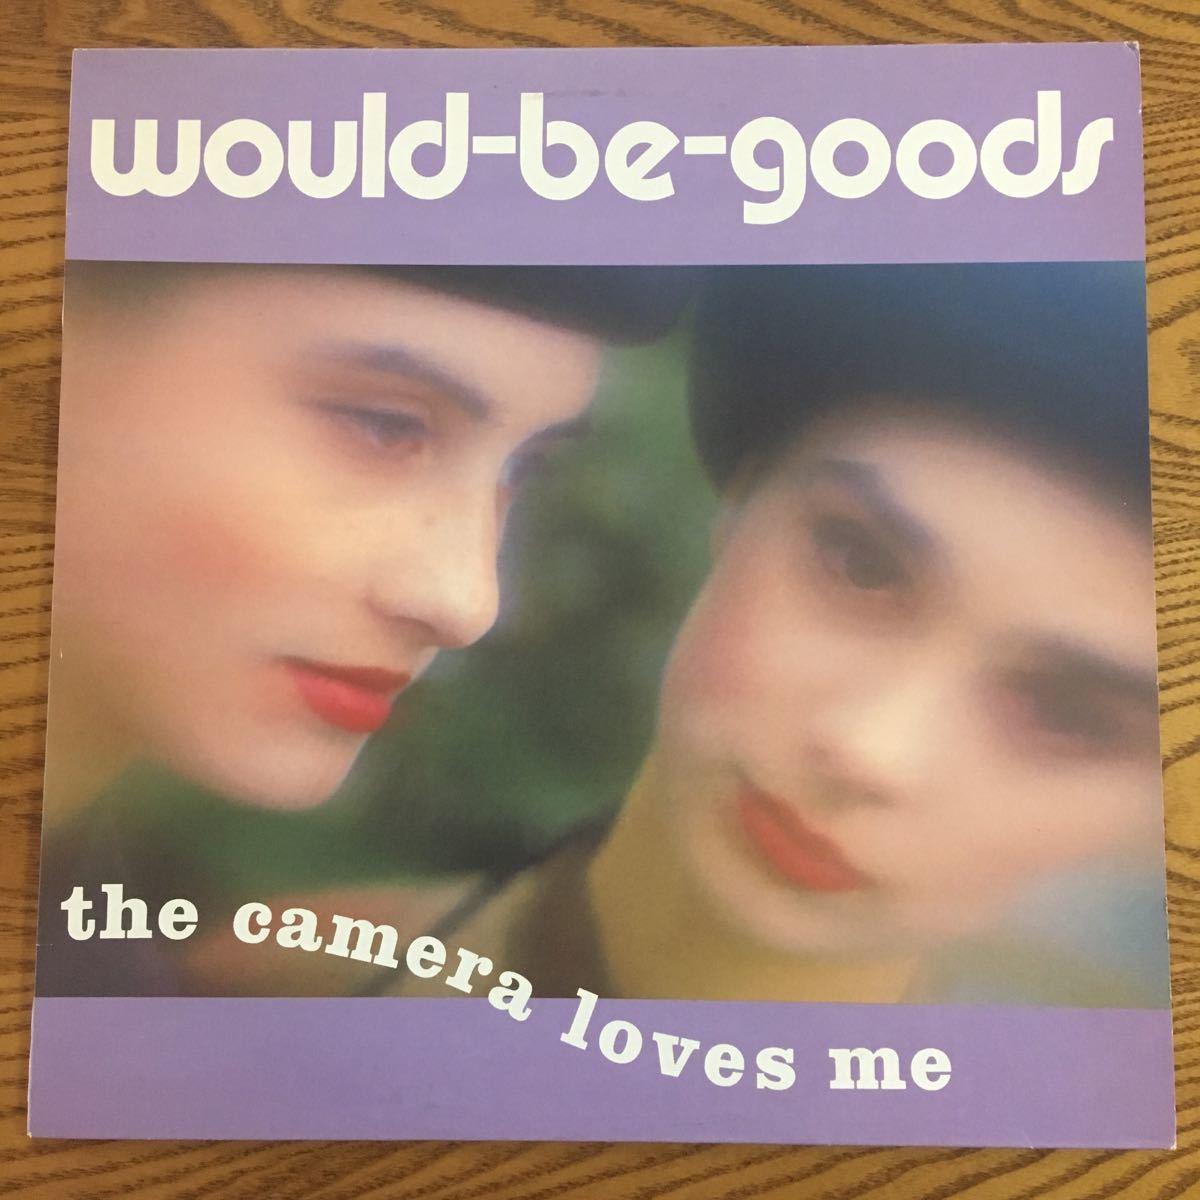 【LP】WOULD-BE-GOODS/CAMERA LOVES ME[UKオリジナル/CHERRY RED/el] ★ネオアコ ギター・ポップ コーネリアス カヒミ・カリィ_画像1